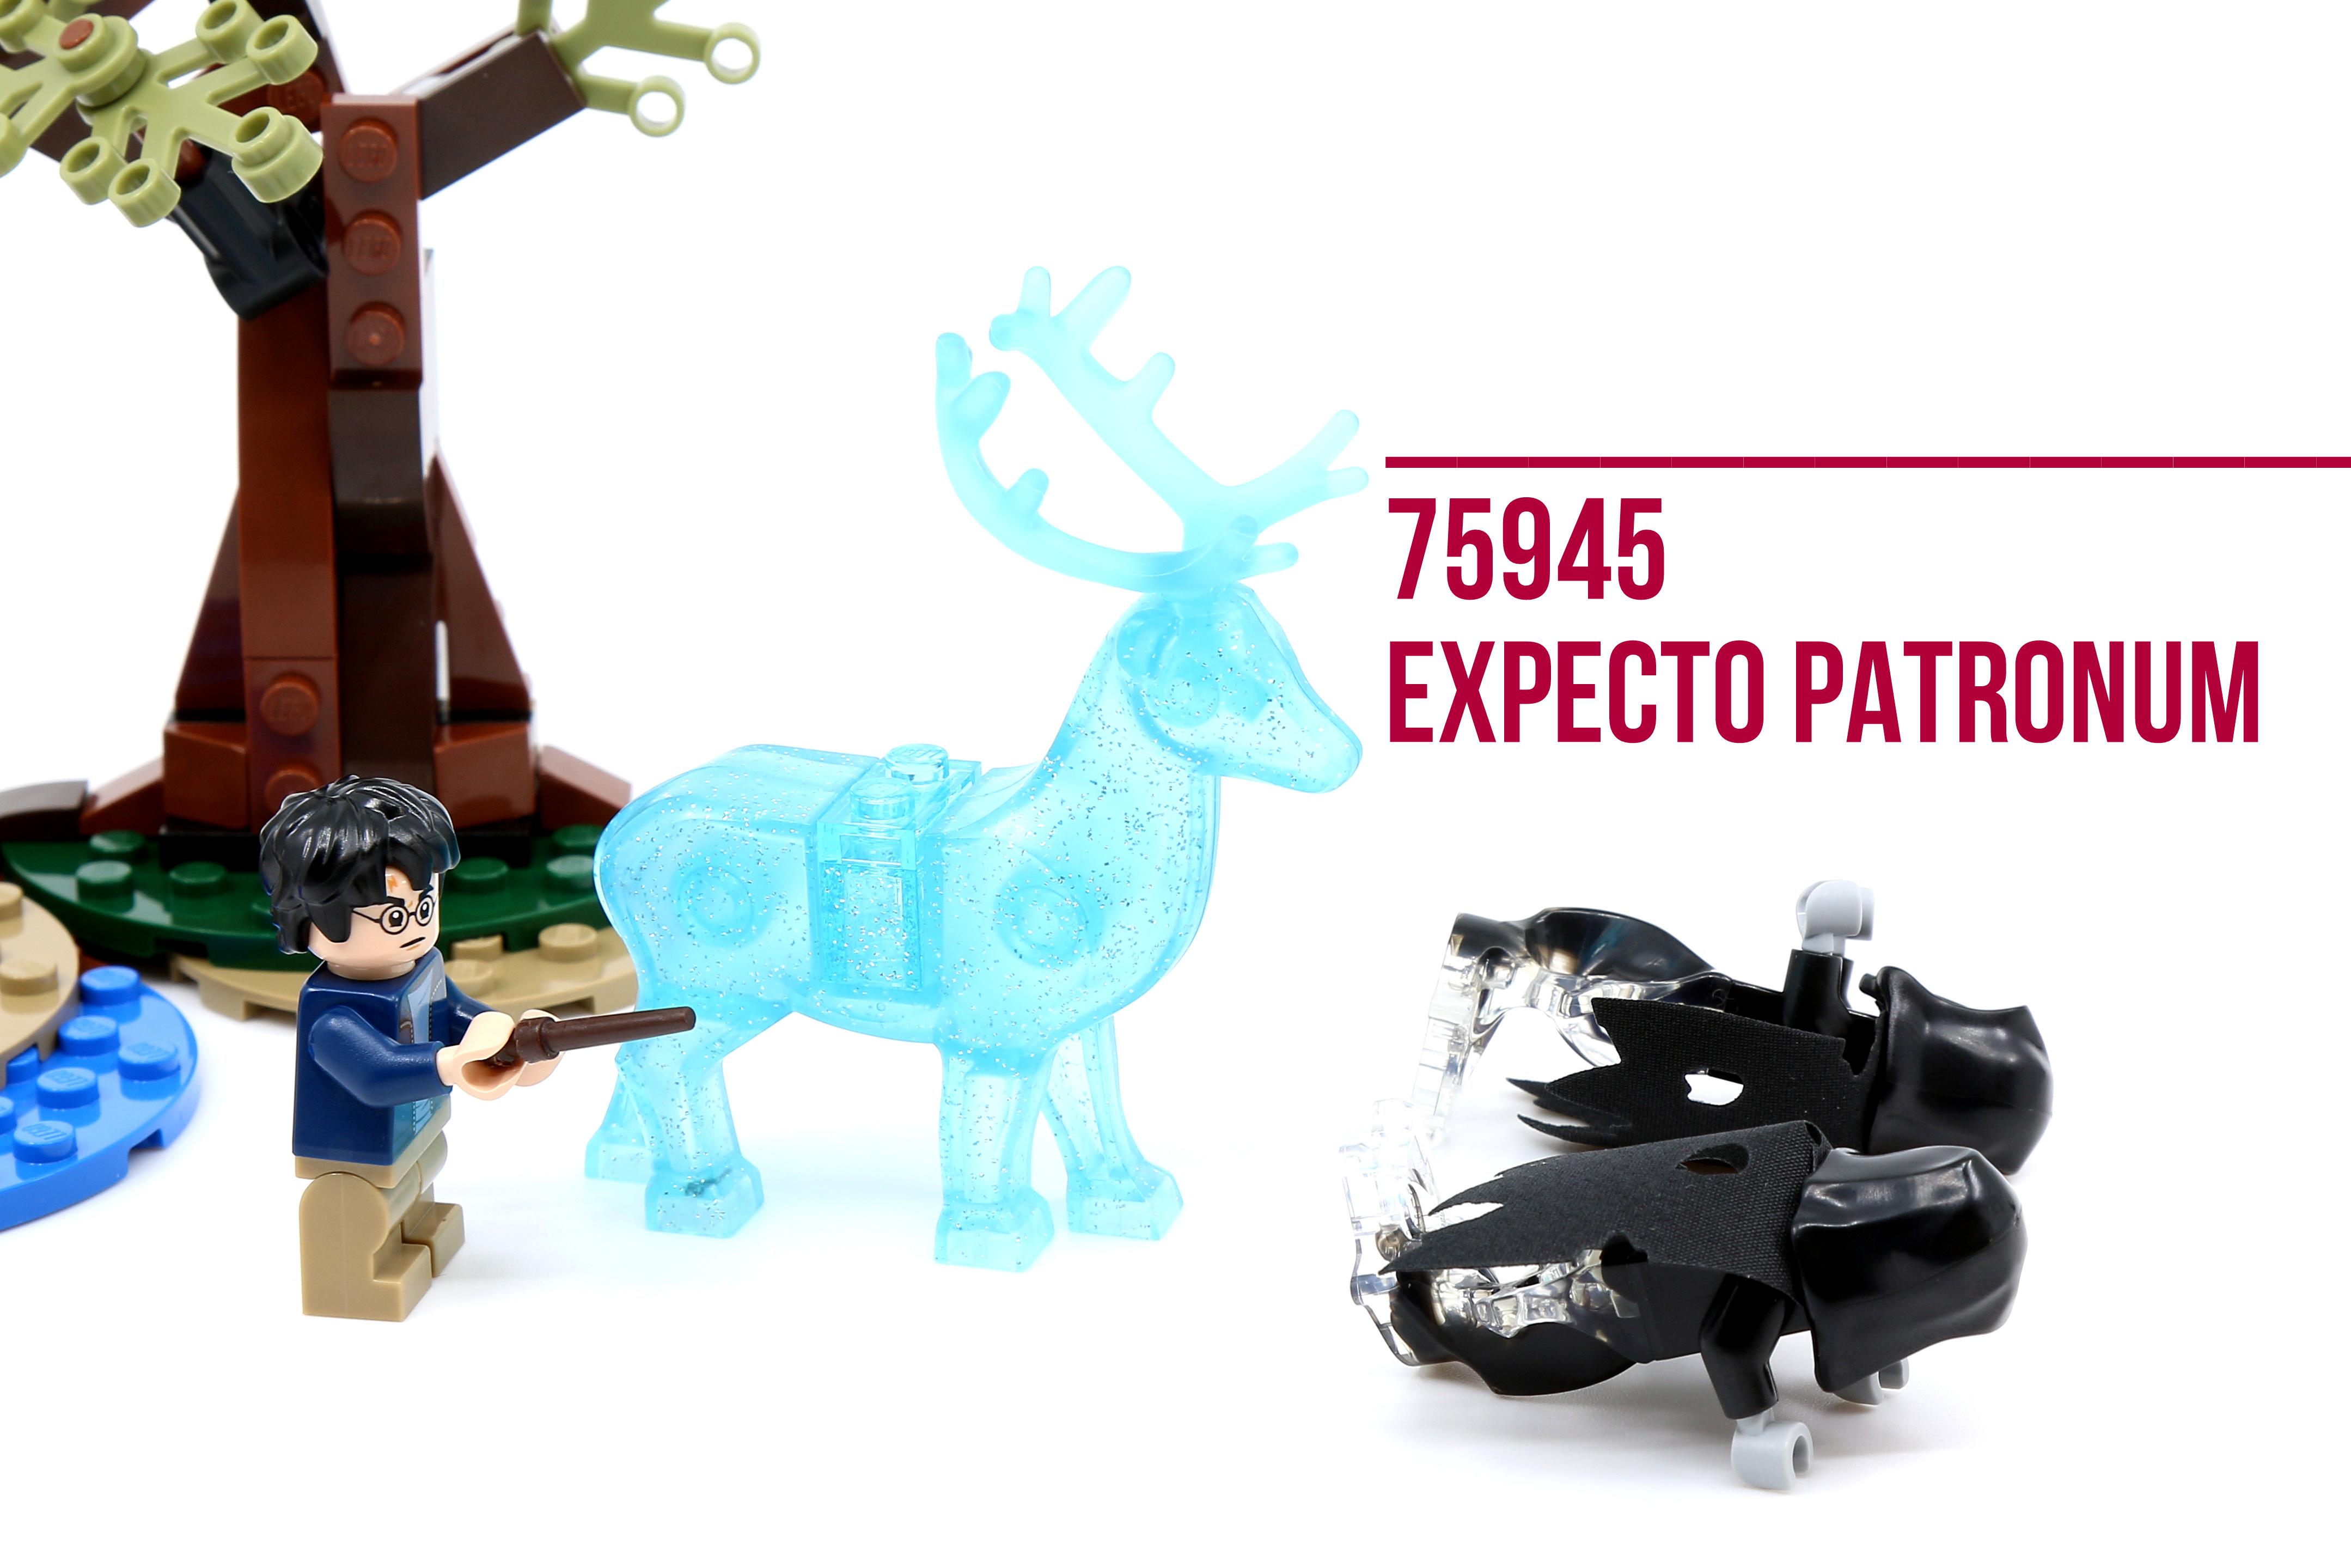 LEGO® Harry Potter Expecto Patronum Building Set 75945 NEW